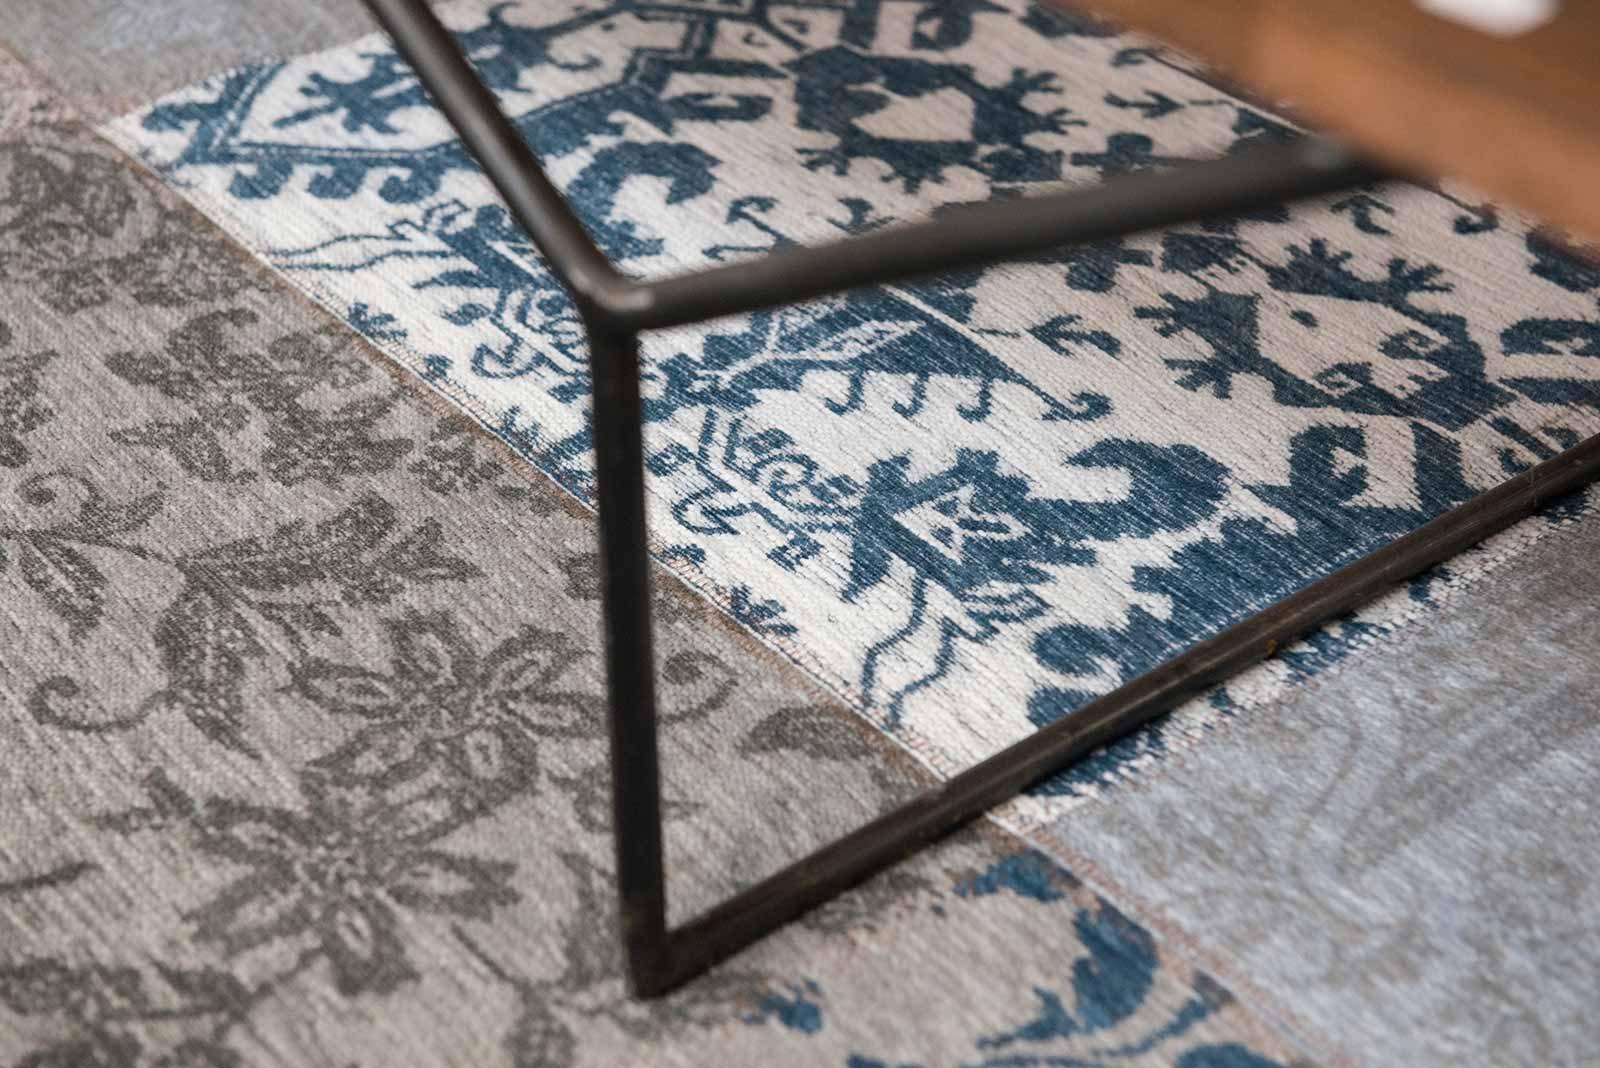 tapijt Louis De Poortere LX8981 Vintage Bruges Blue zoom 1